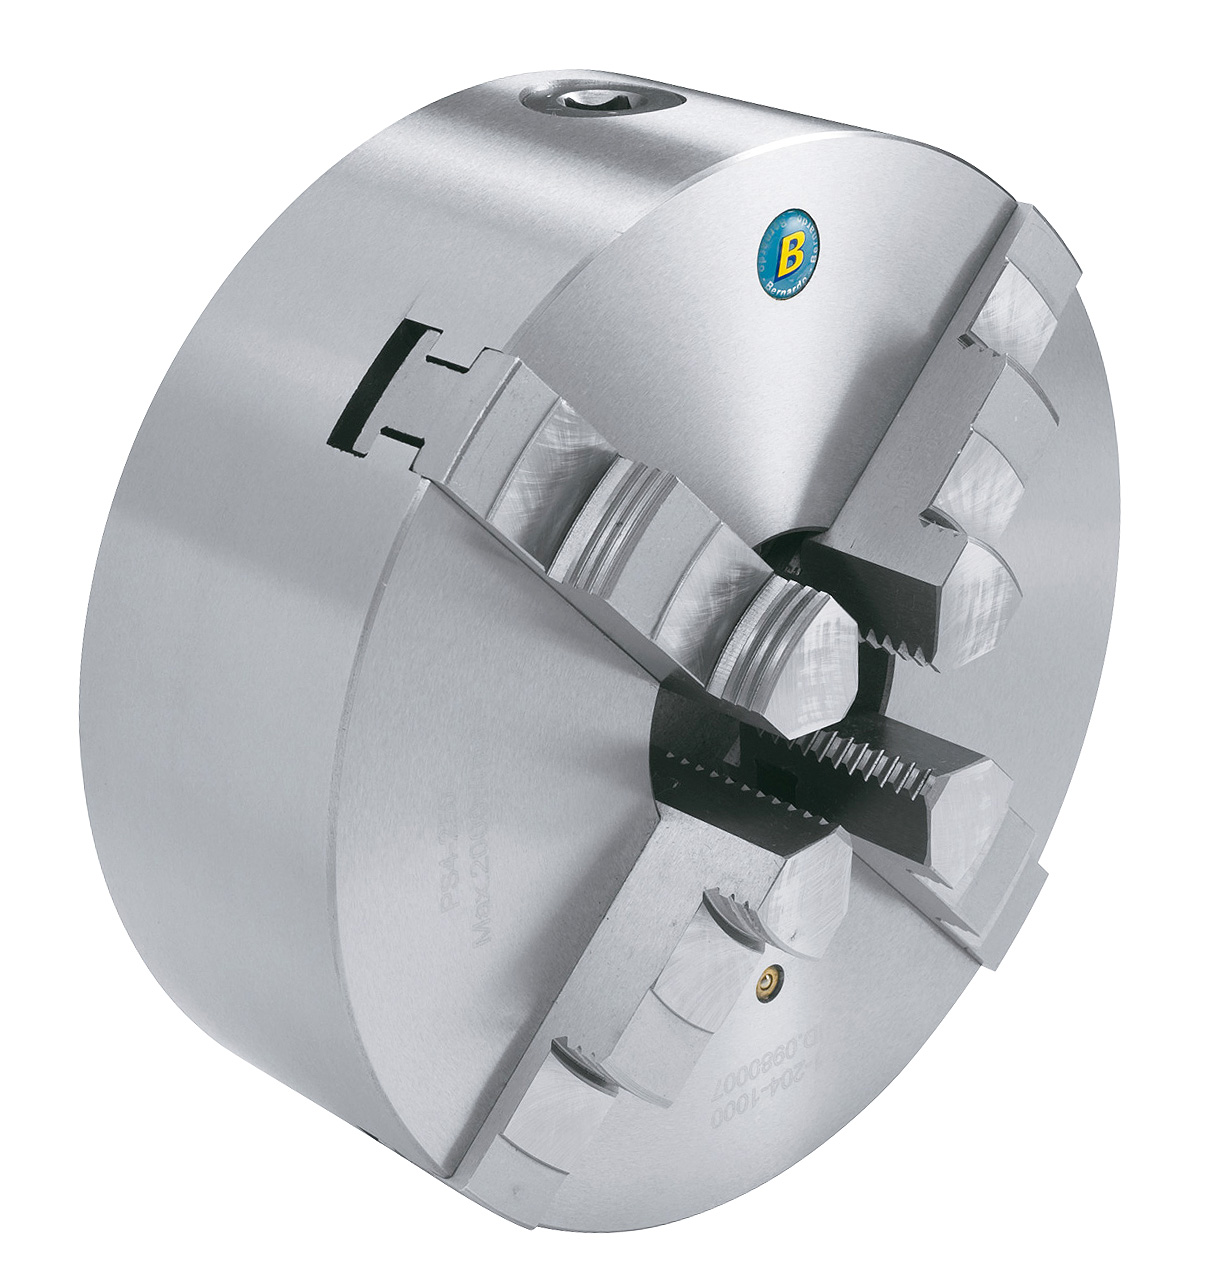 4 bakket centrerpatron standard DK12-315/D6